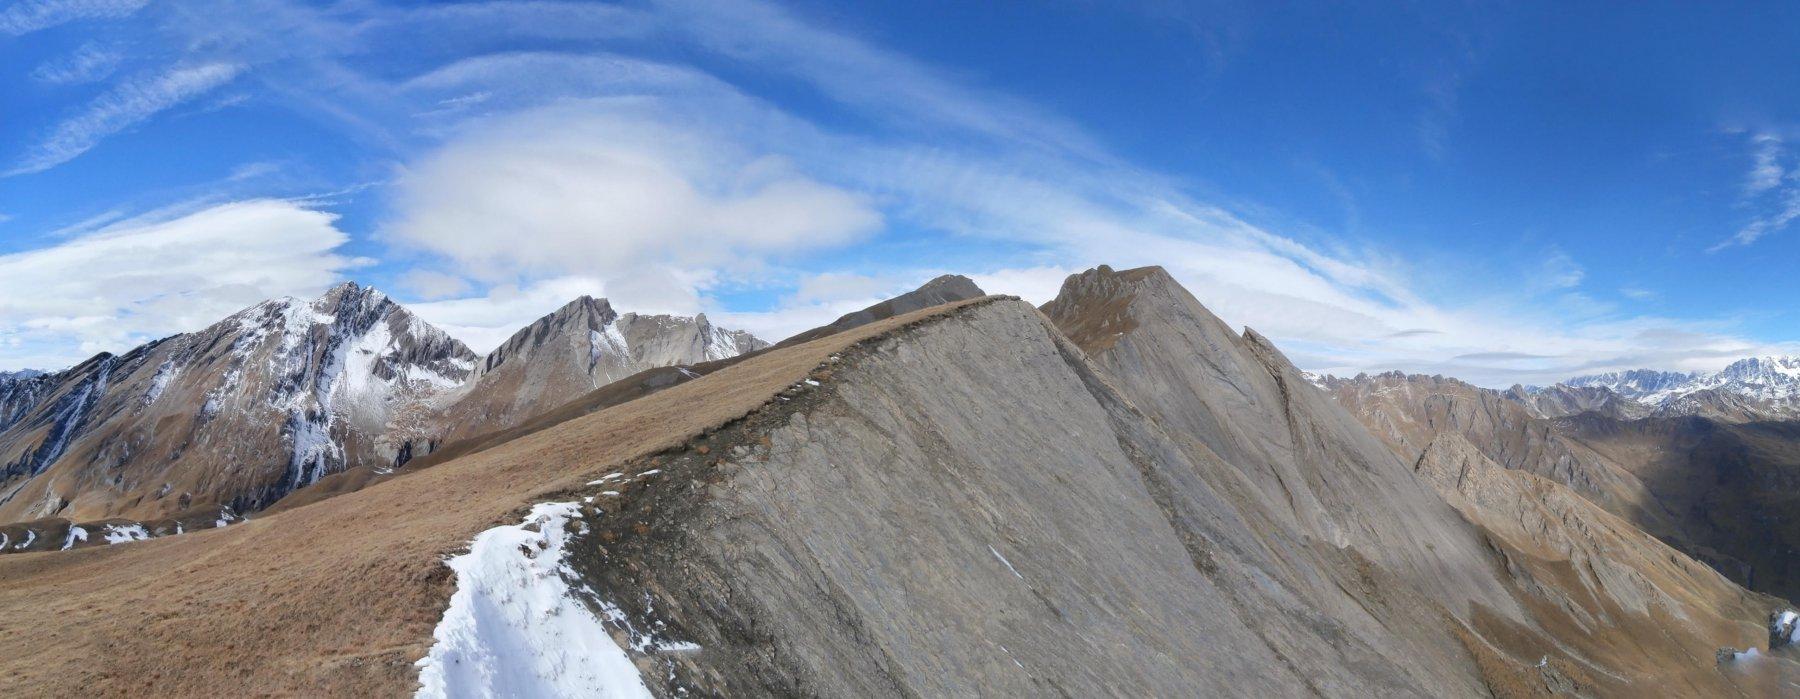 Serena (Cresta), punta 2785 m da Planaval per la punta 2710 m 2015-10-22